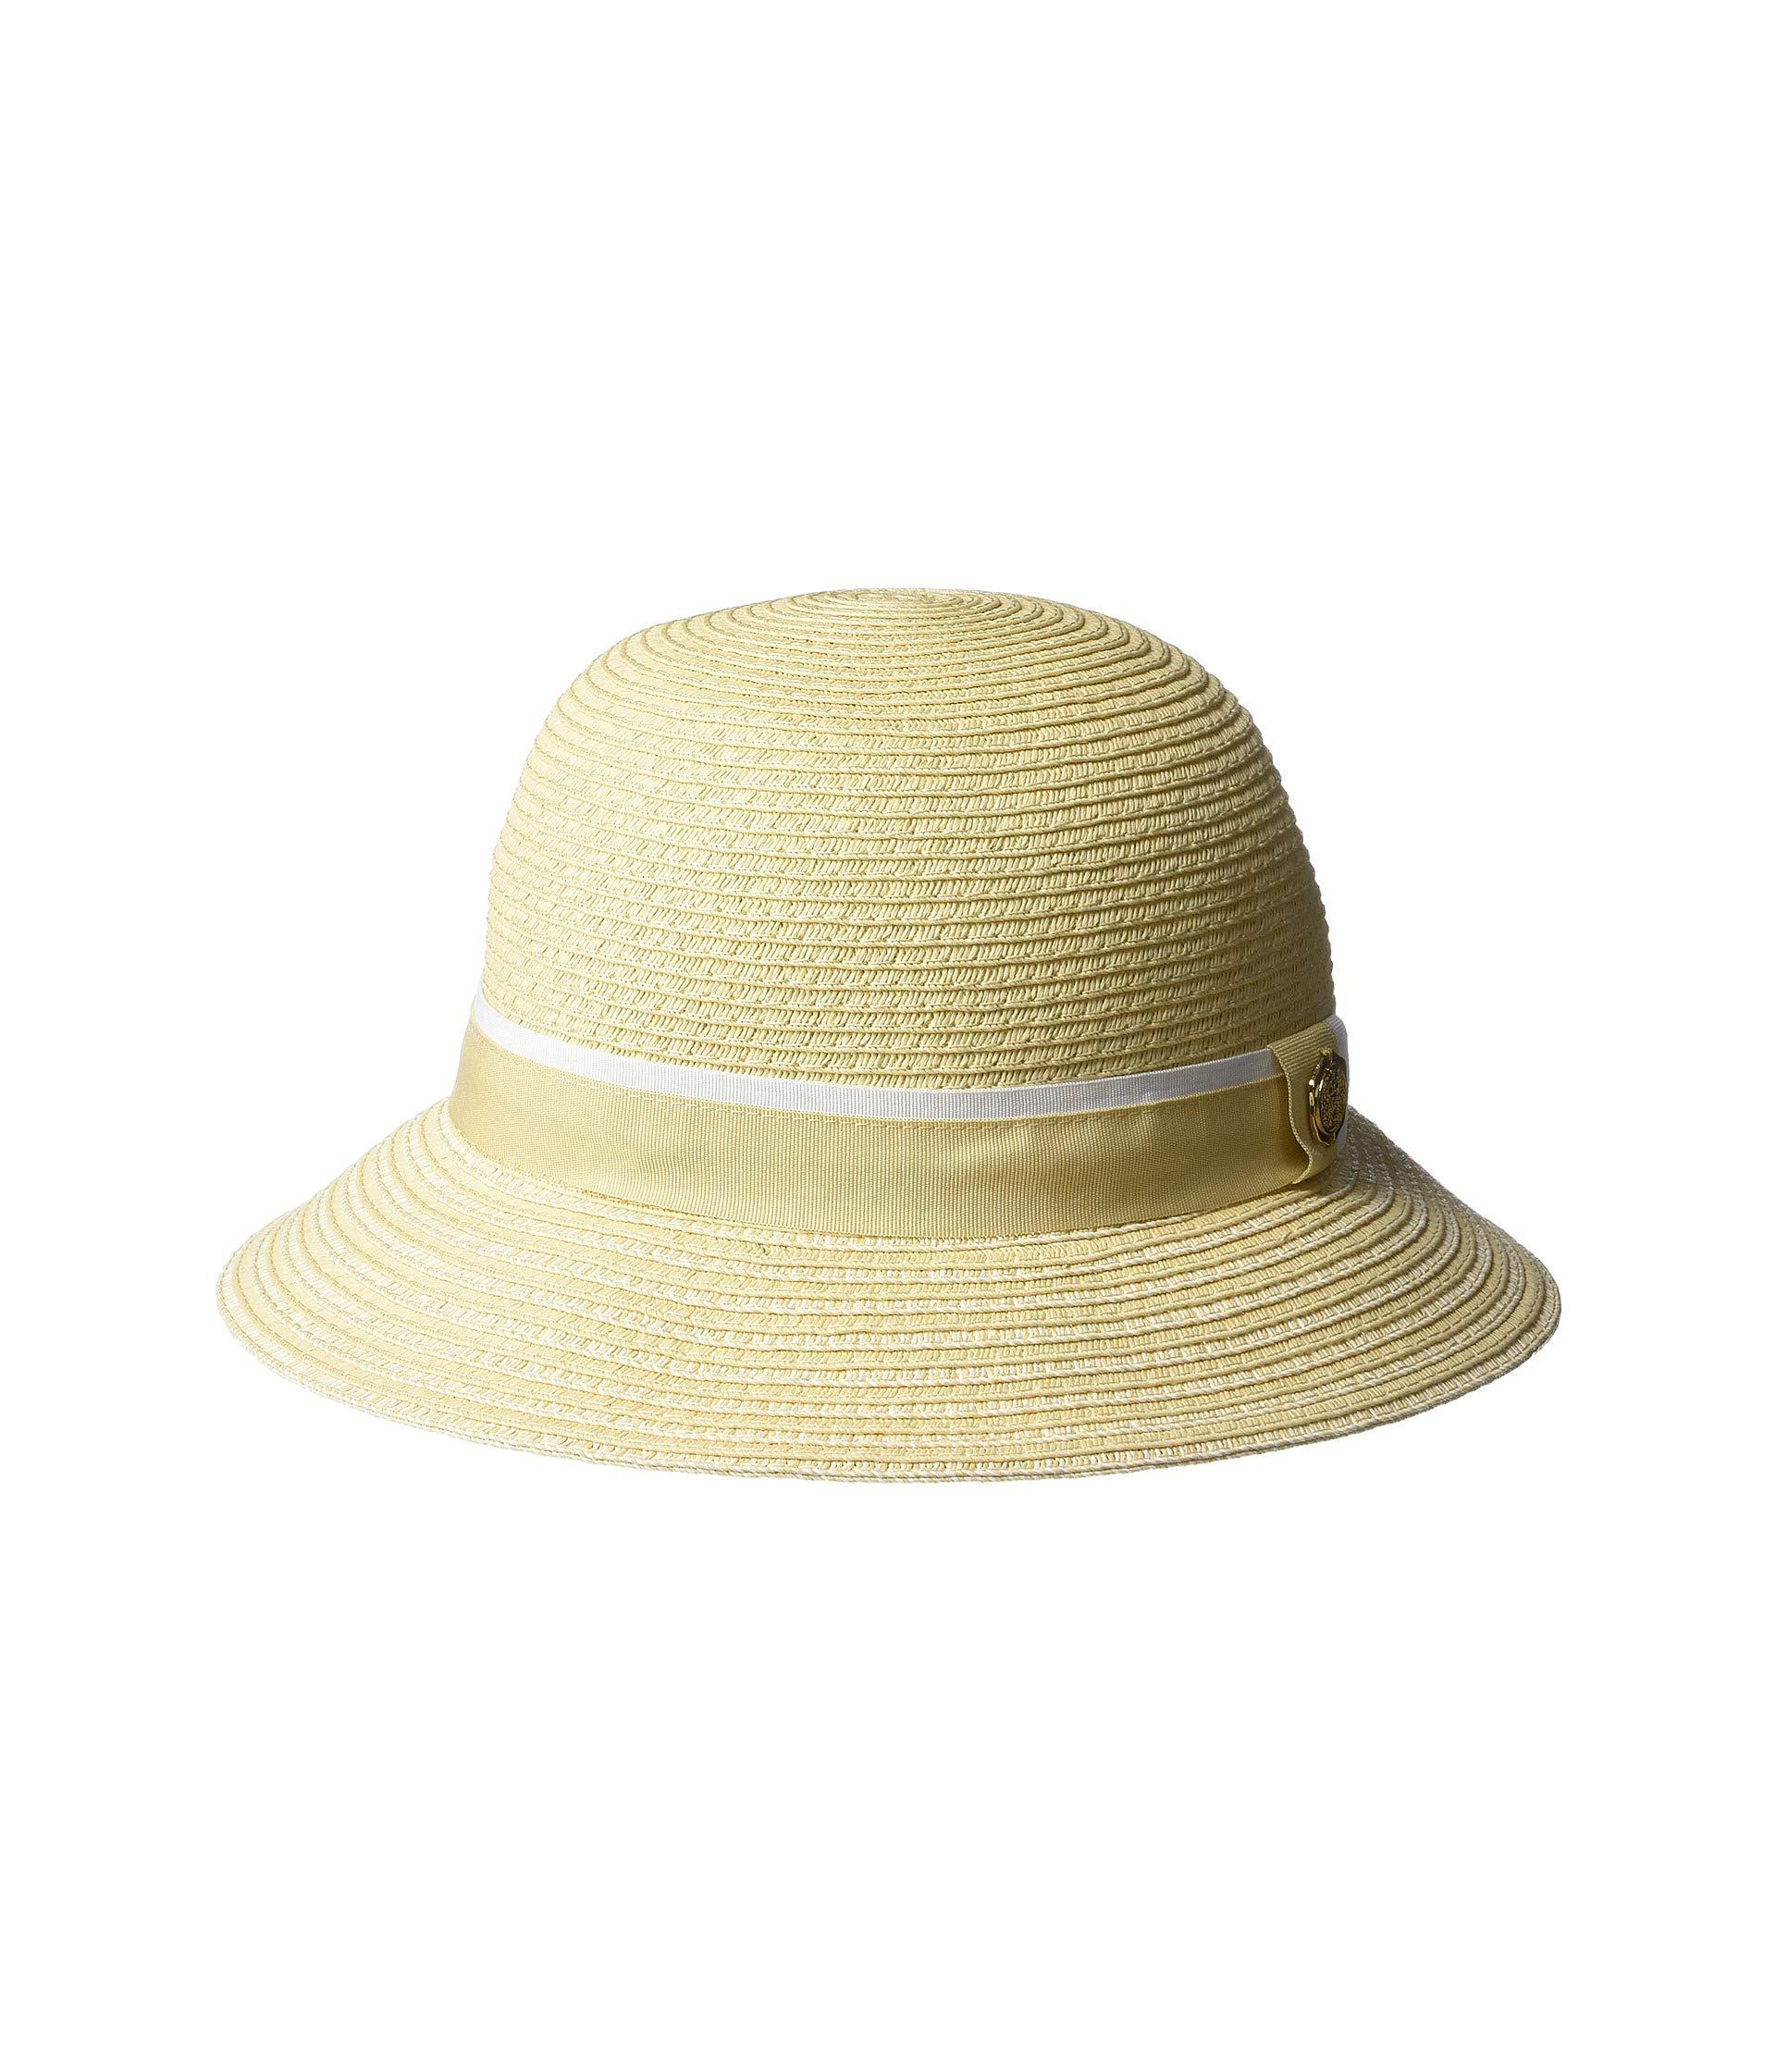 510a3e61d09 Vince Camuto. Women s Stripe Grosgrain Cloche (shell) Caps